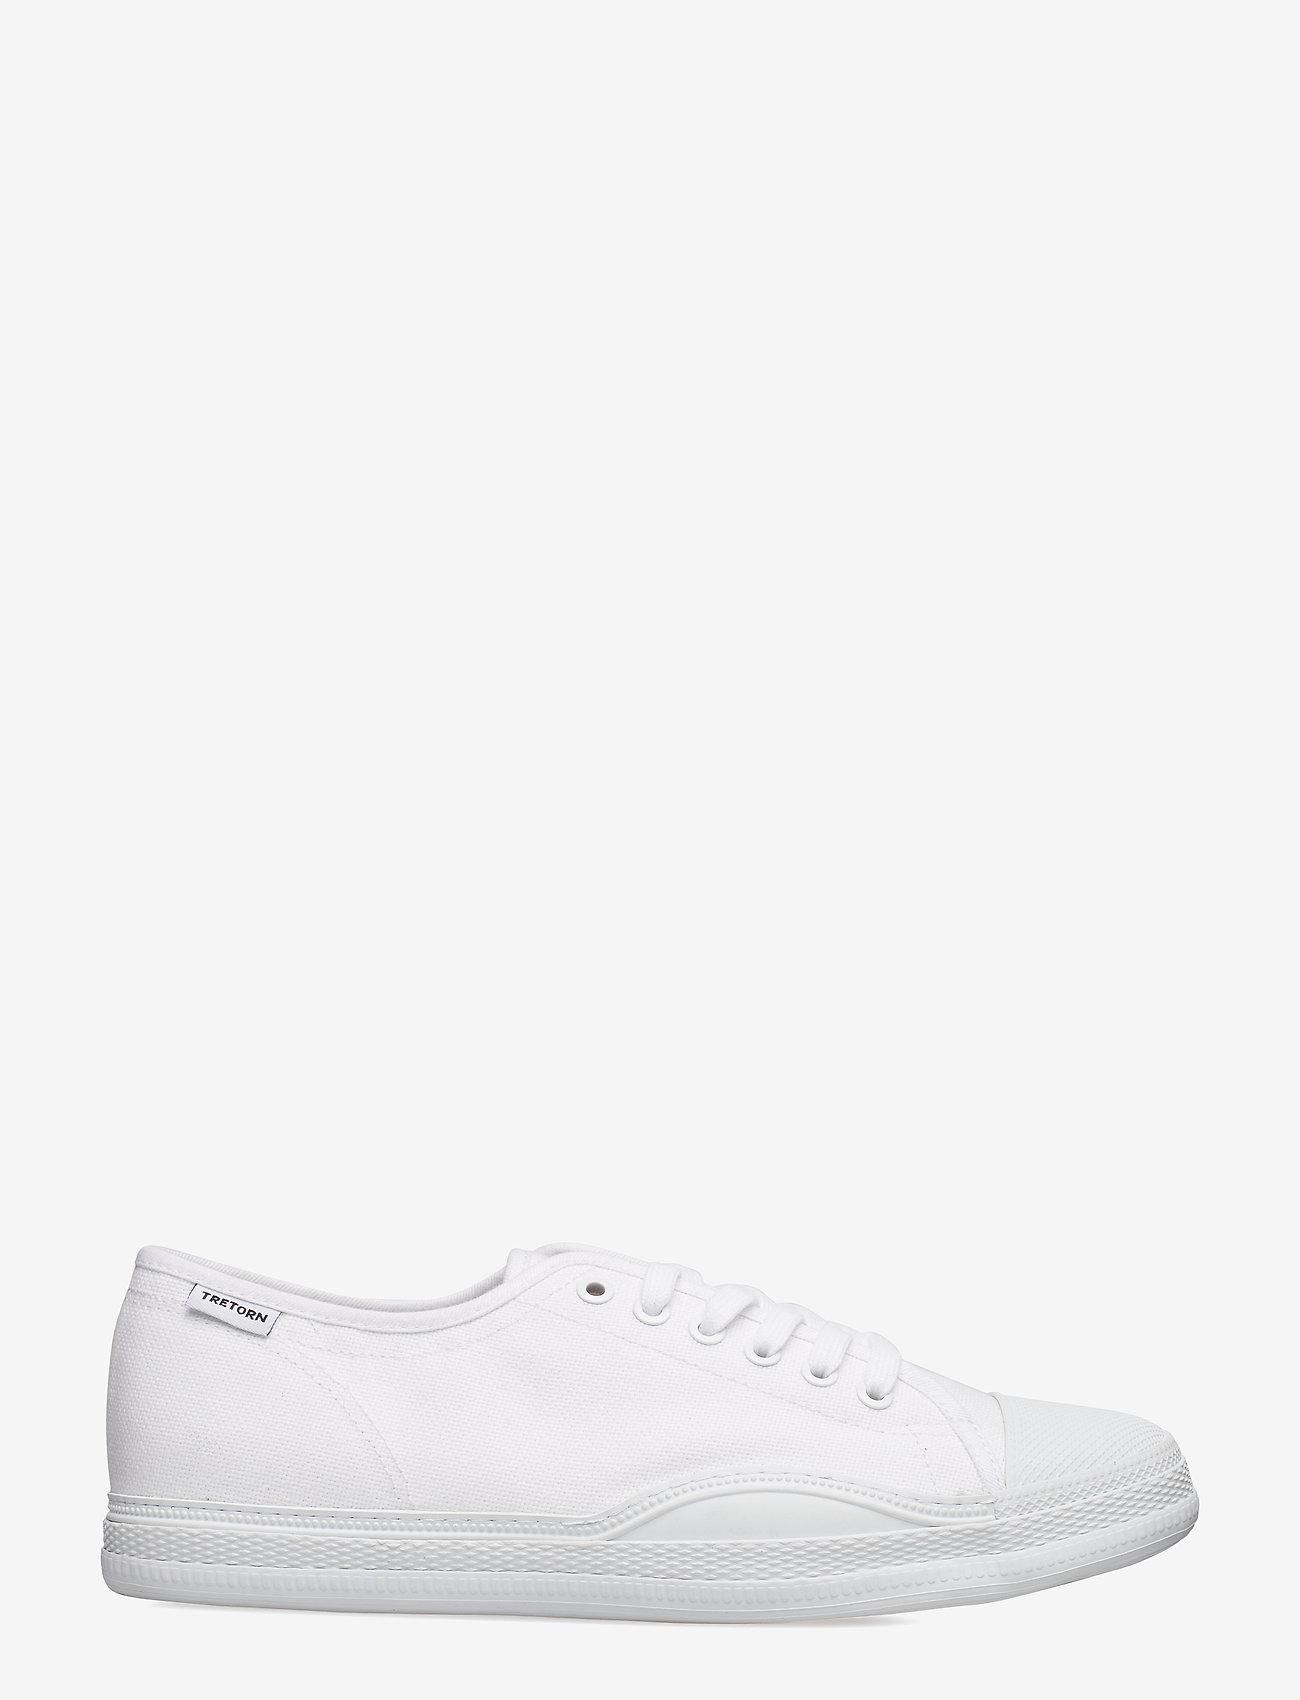 Tretorn - RACKET - låga sneakers - 003/white/white - 1